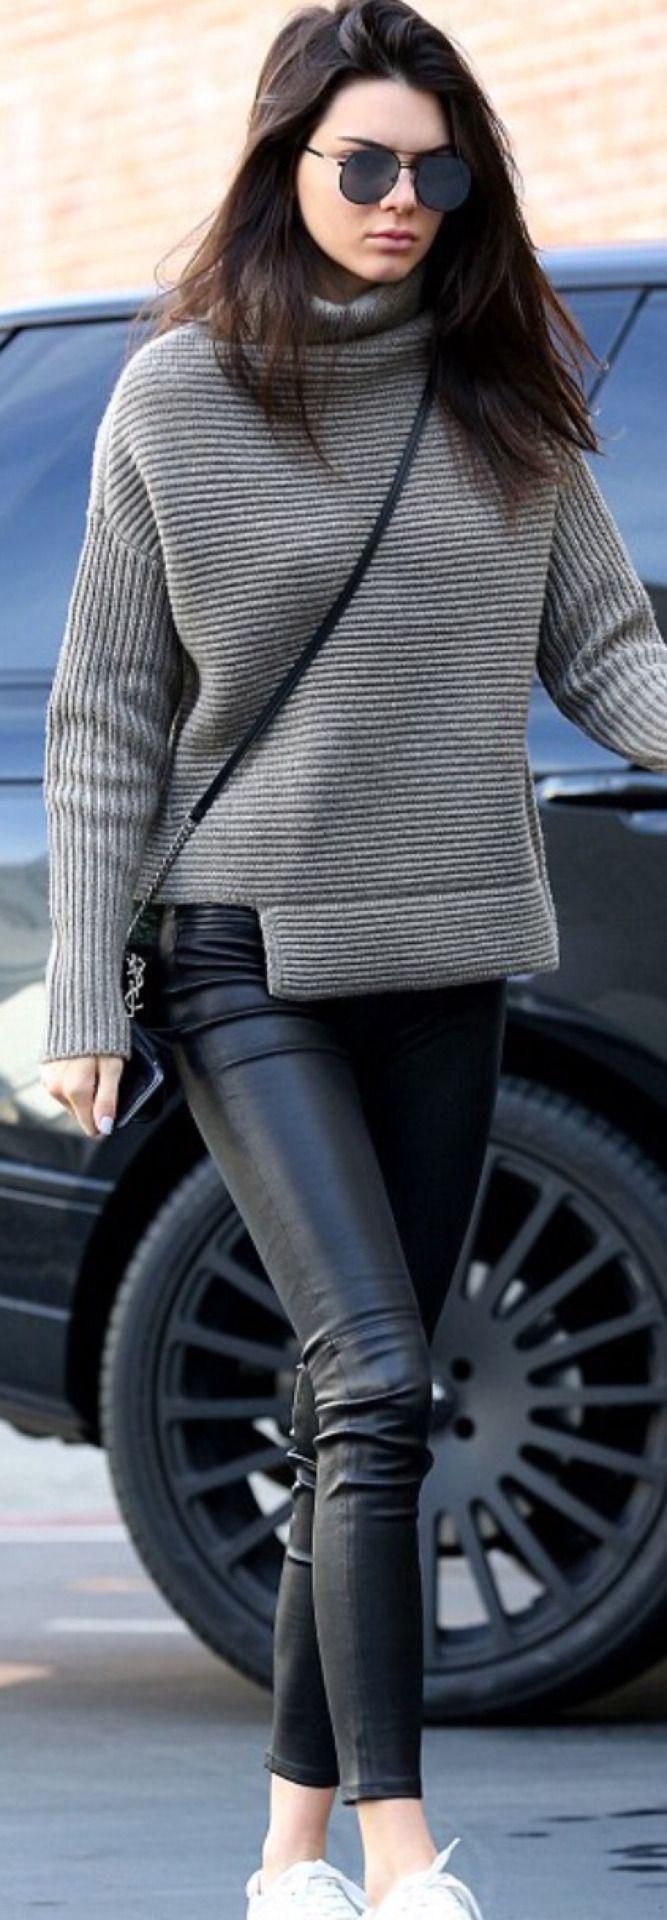 Khloe kardashian flannel shirt  Kendall Jenner  StarAndMore  Pinterest  Khloe kardashian and